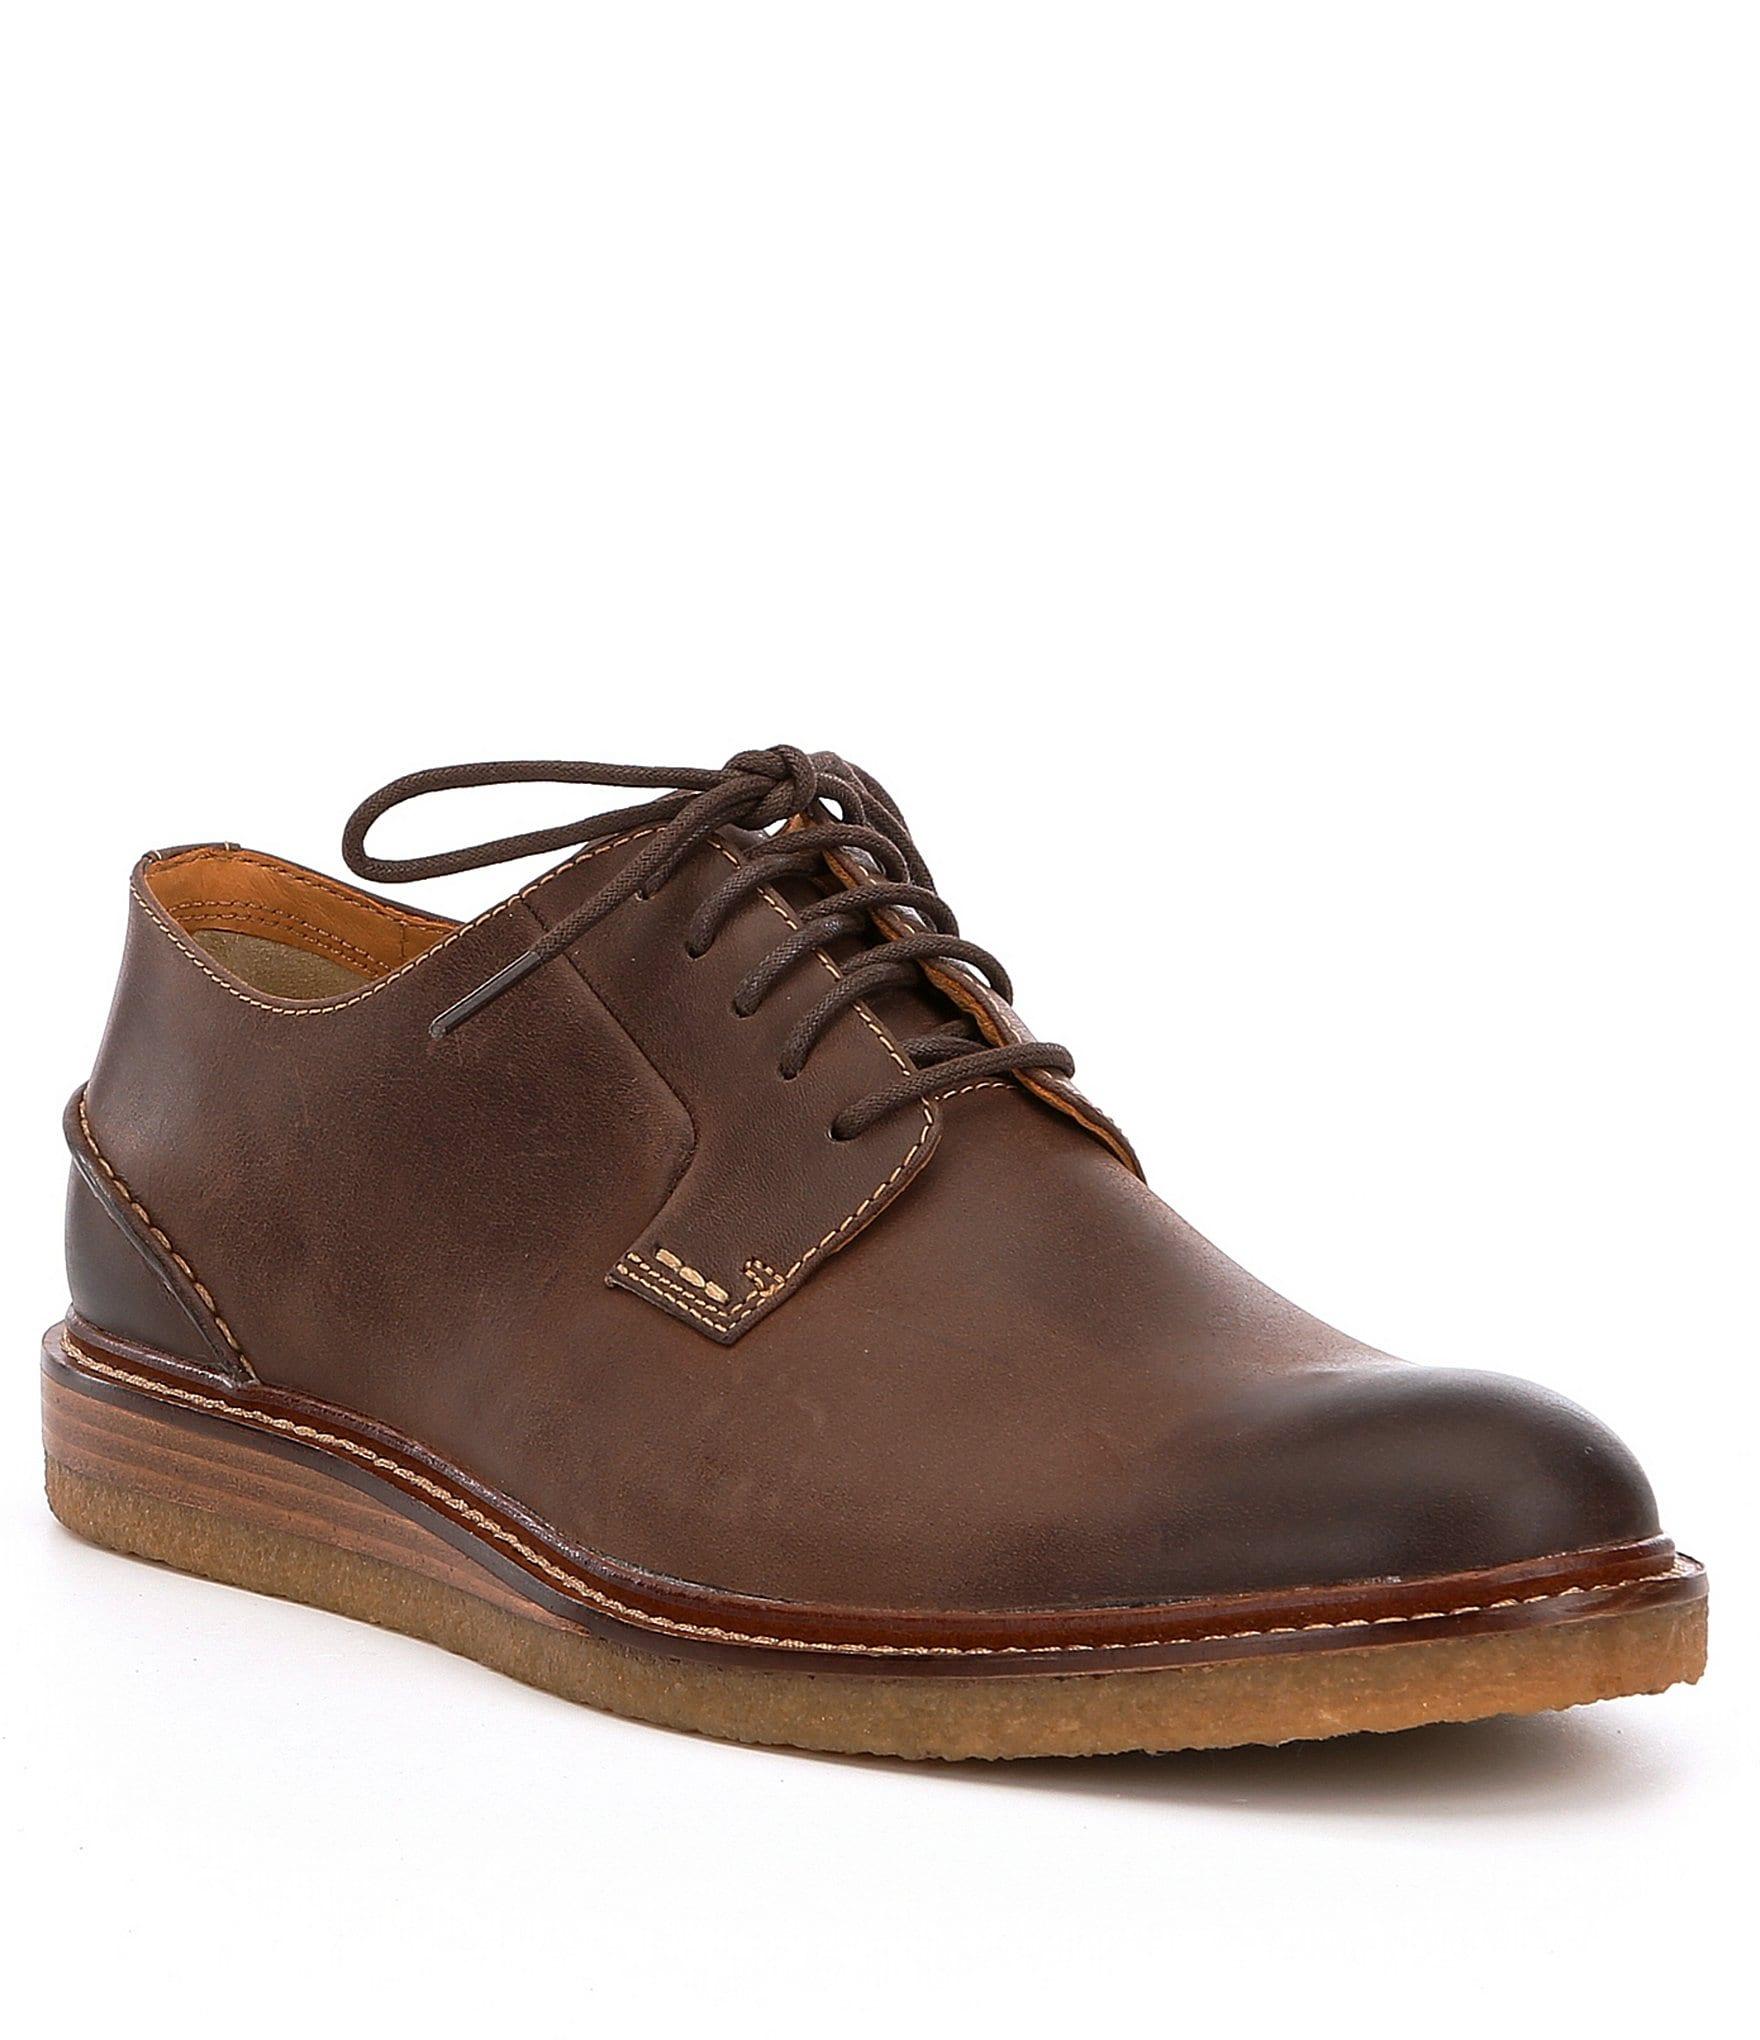 ac62c99209e7 Buy michael kors mens dress shoes   OFF77% Discounted